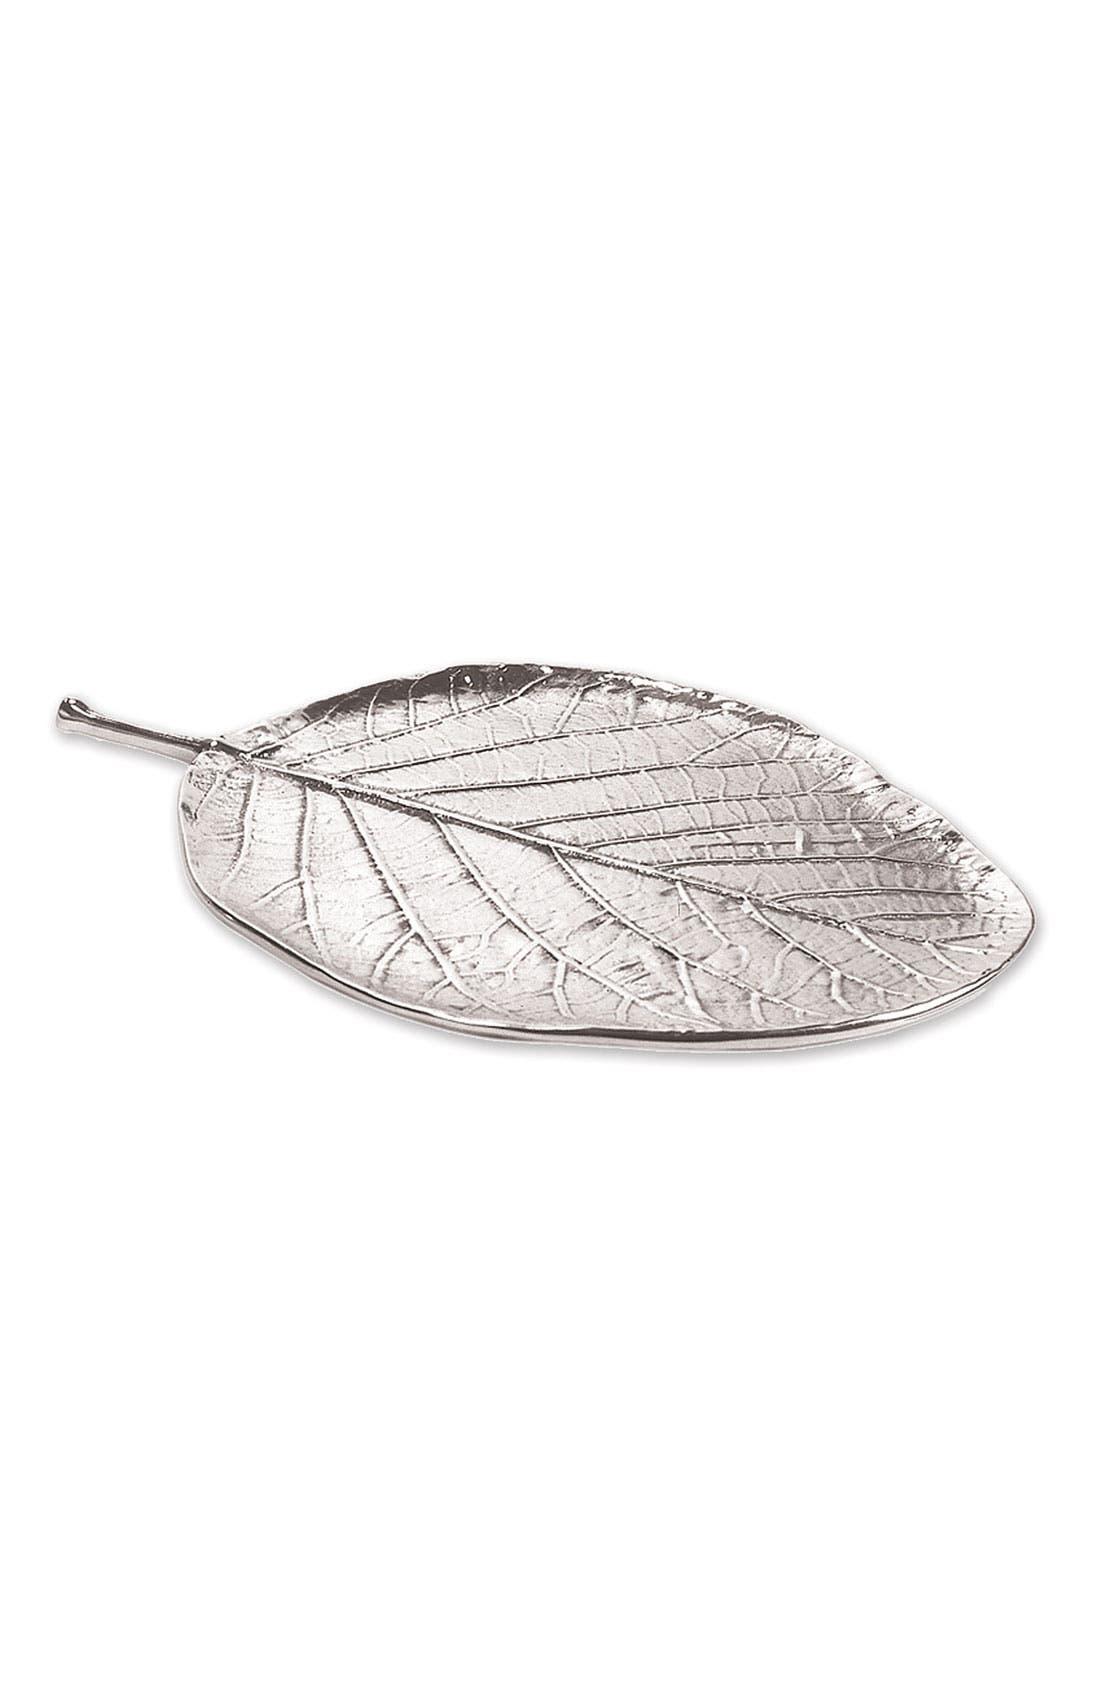 Alternate Image 1 Selected - Michael Aram 'Botanical Leaf' Tray